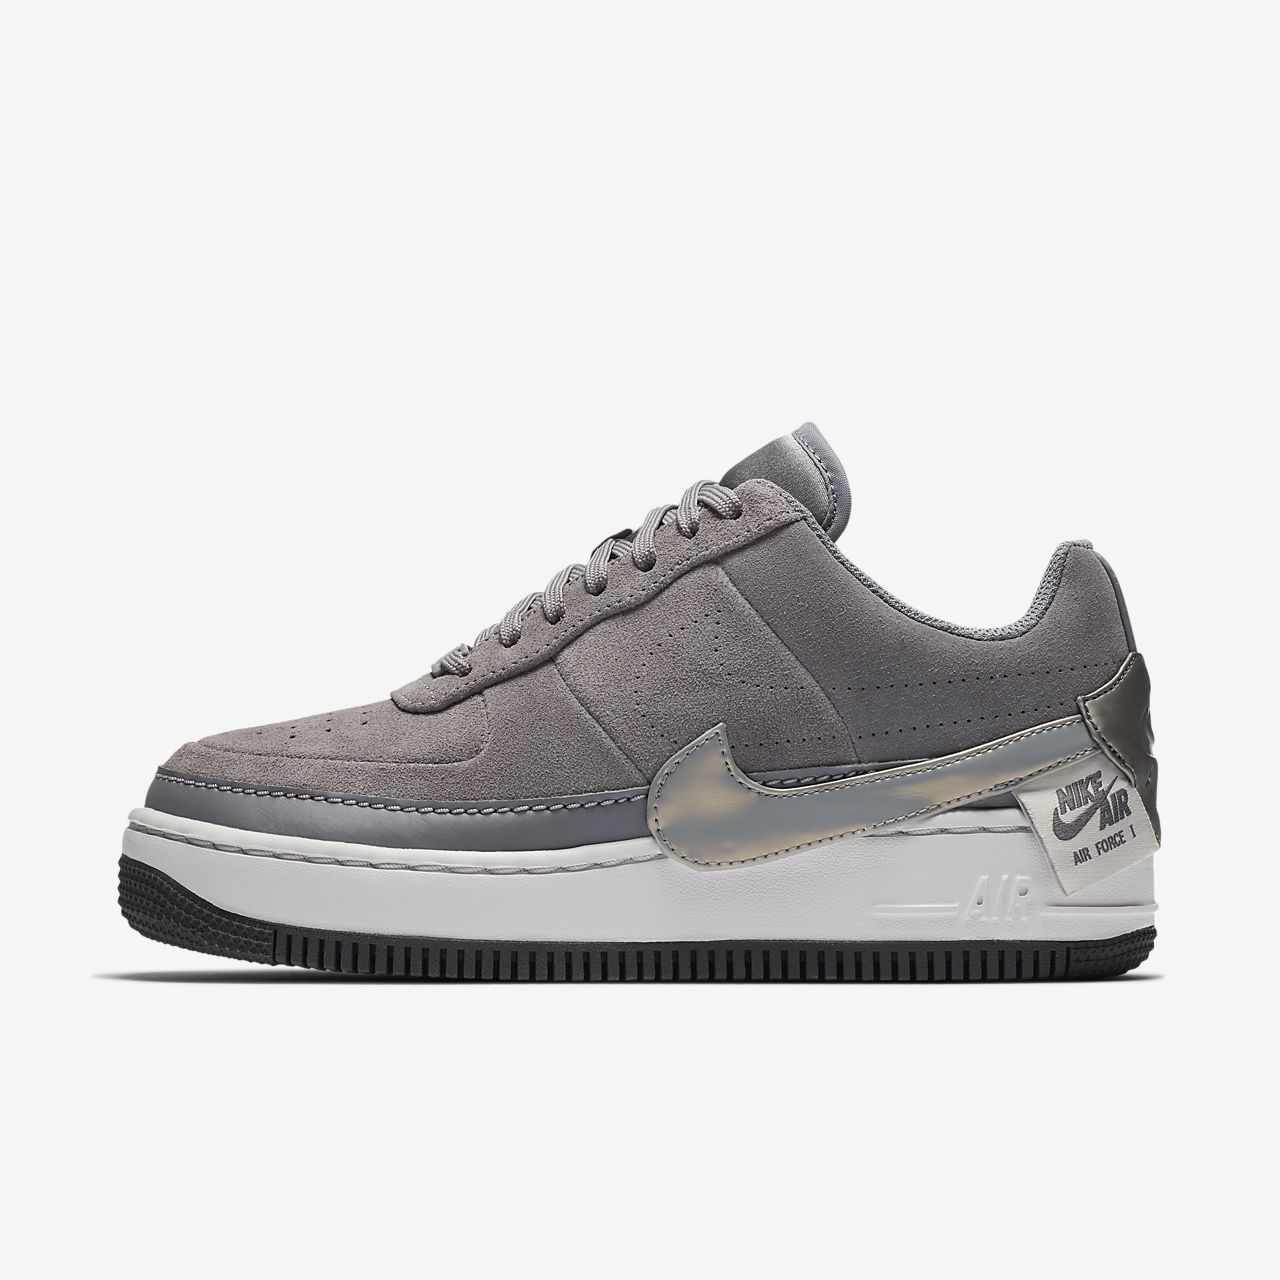 Femme Jester Btwqaraf Nike Chaussure Be Metallic Air Force Pour 1 1lKTFJ3c